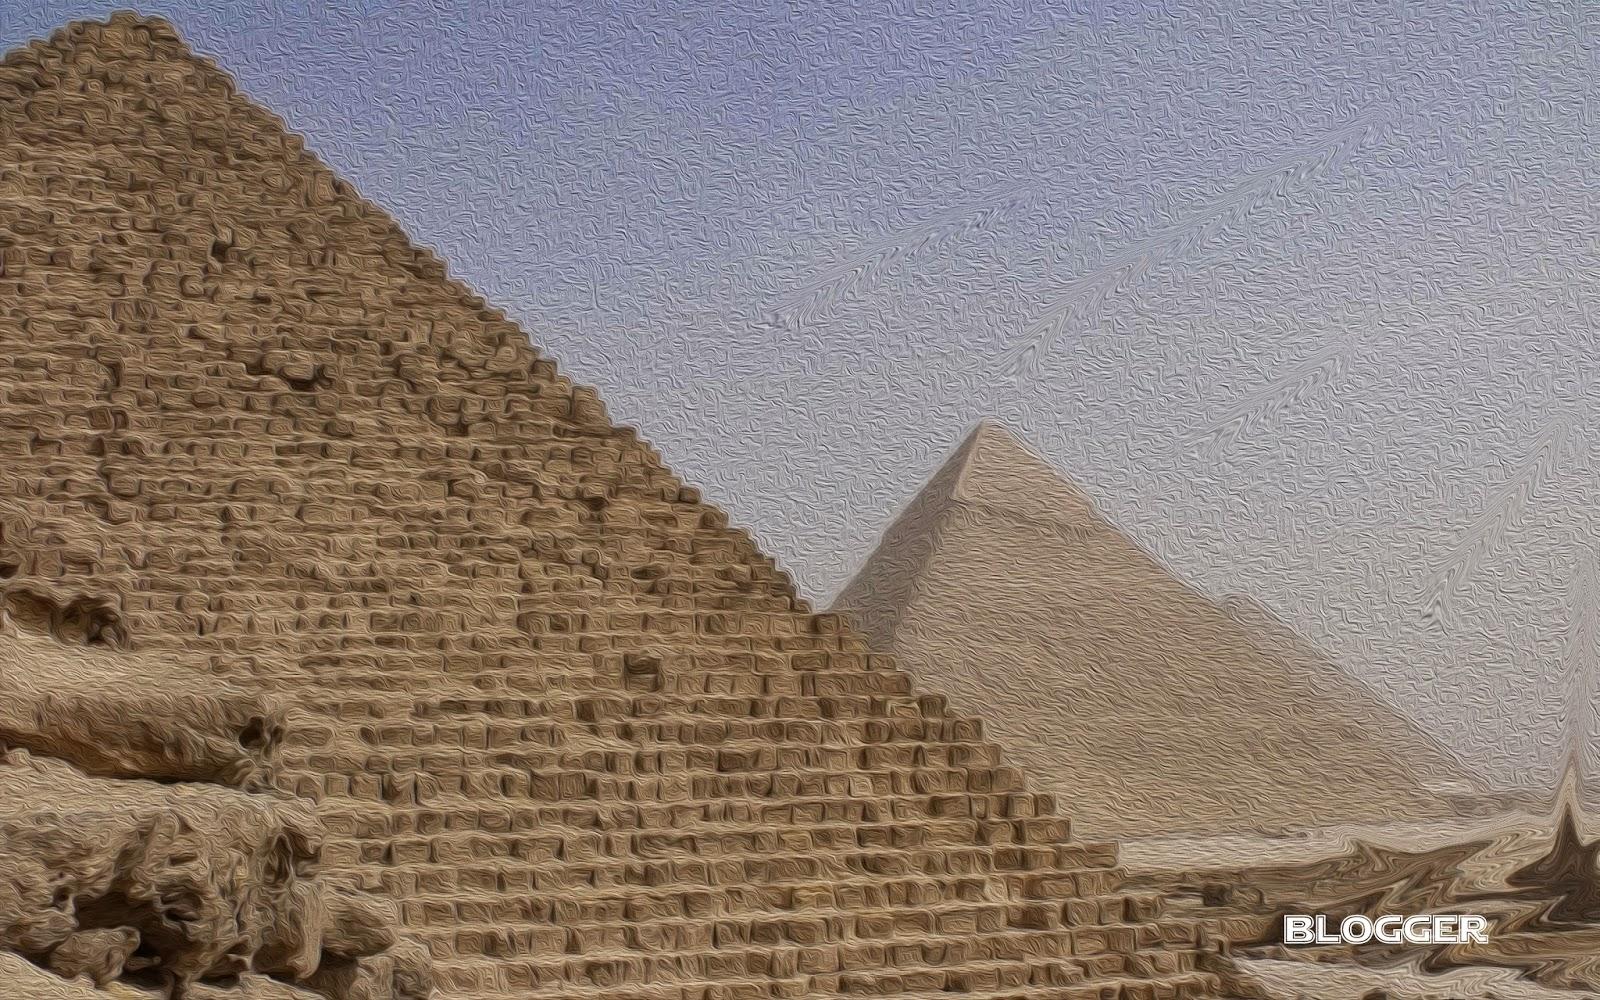 hd egypt pyramids giza